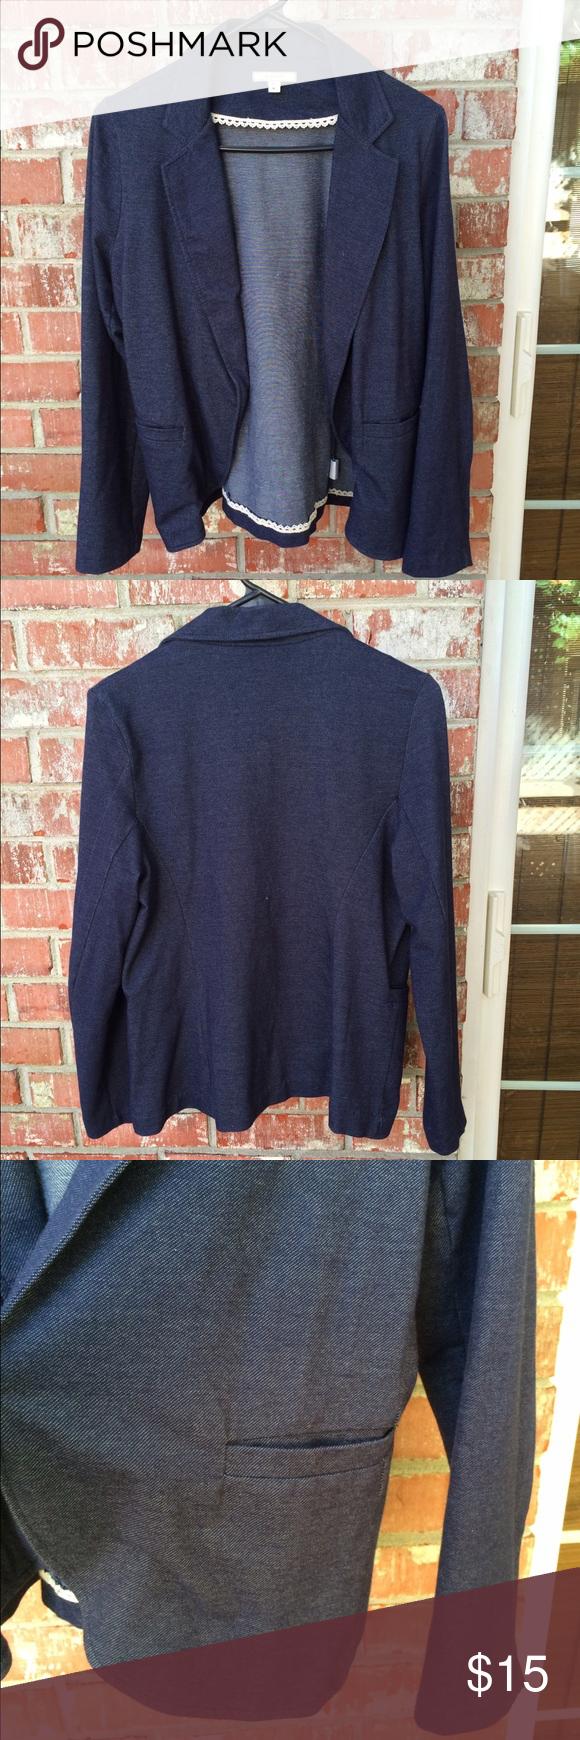 Pleione Open Blazer Faux denim/navy color. 100% cotton. Open blazer. 2 front slip pockets. In new condition Pleione Jackets & Coats Blazers